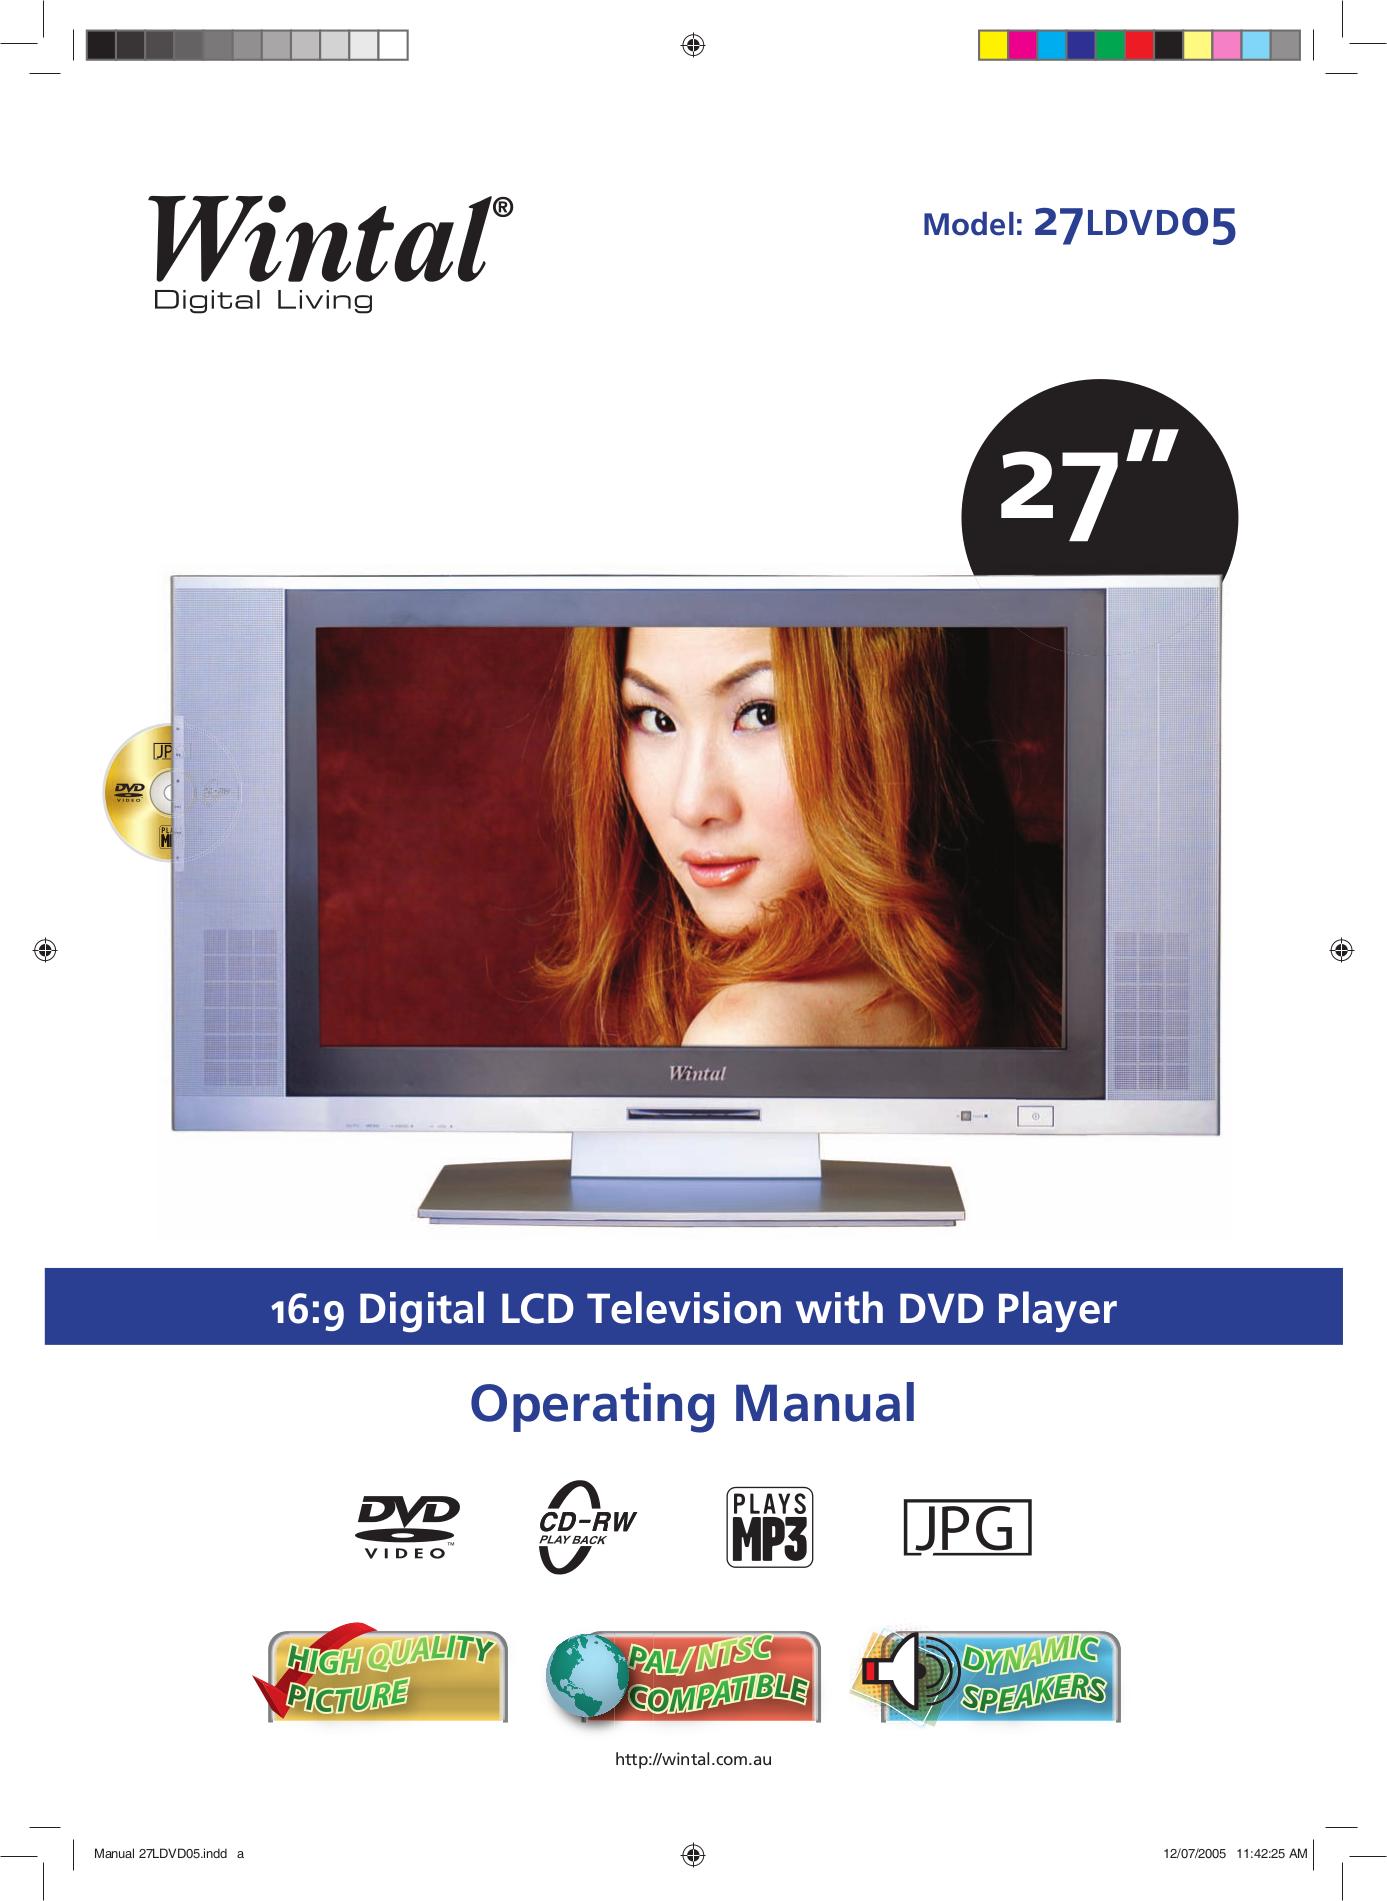 pdf for Wintal TV 27LDVD05 manual